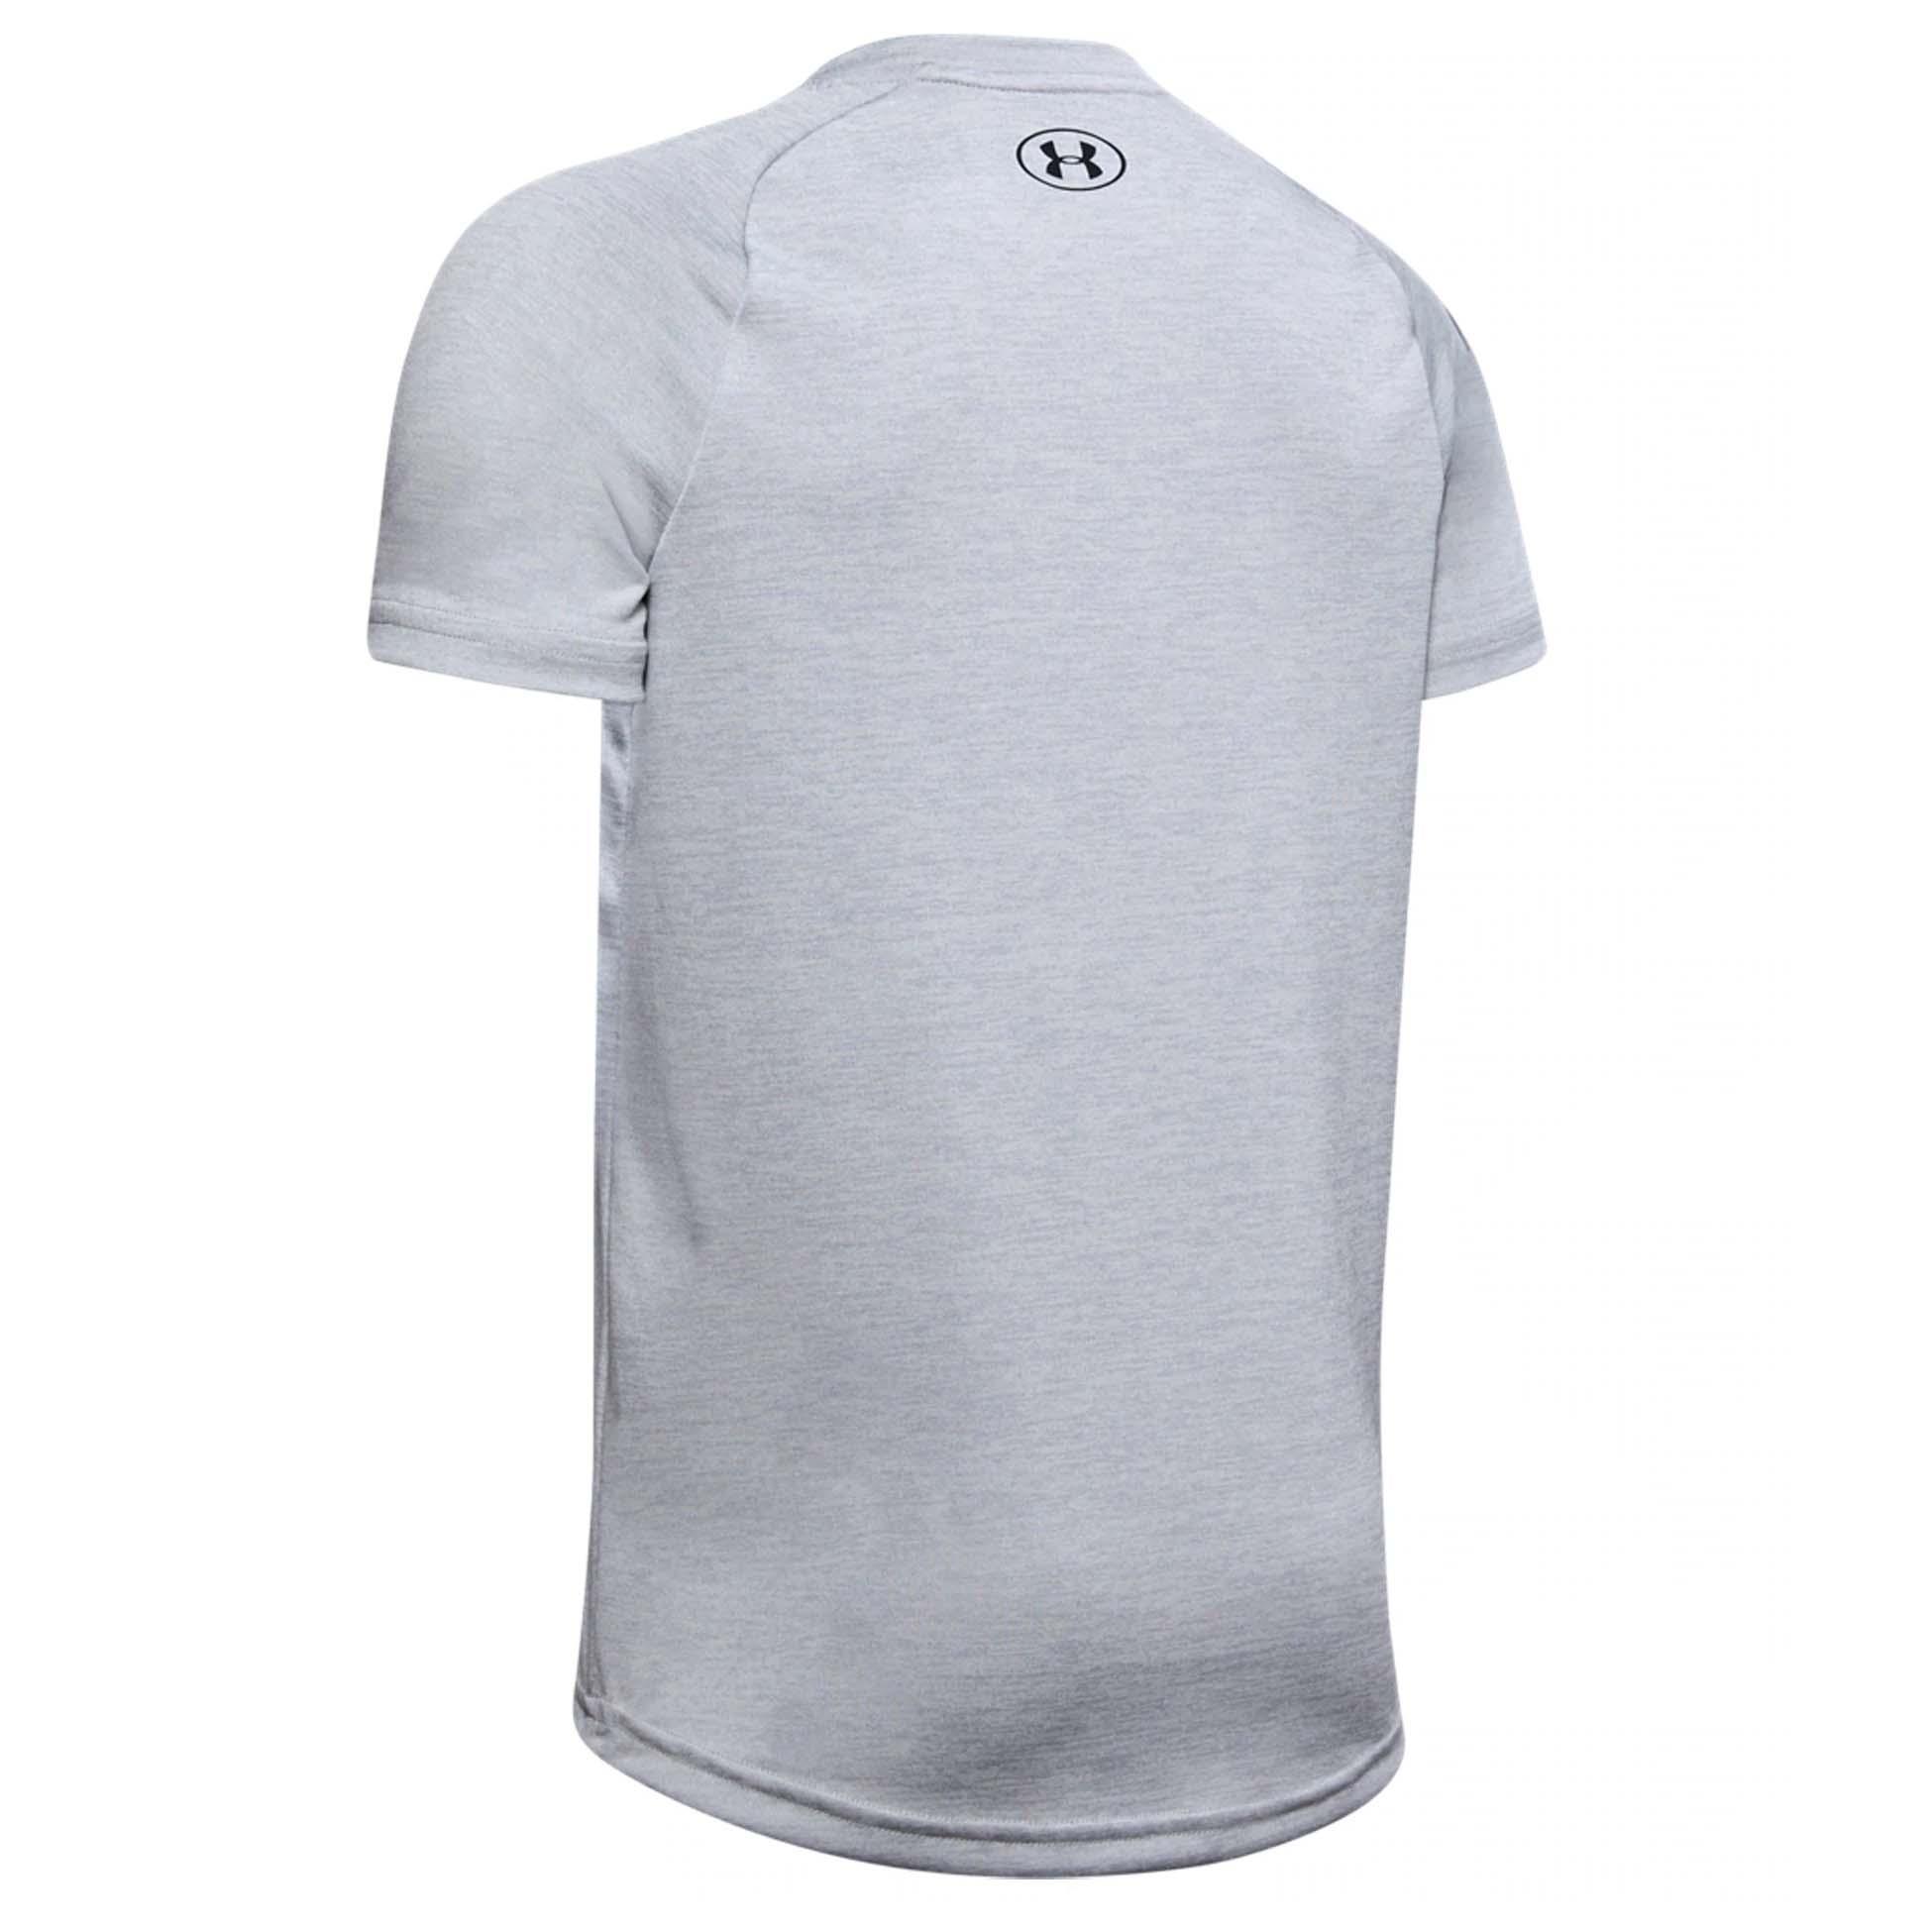 Under Armour Tech 2.0 Kids Fitness Training Short Sleeve T-Shirt Tee Grey